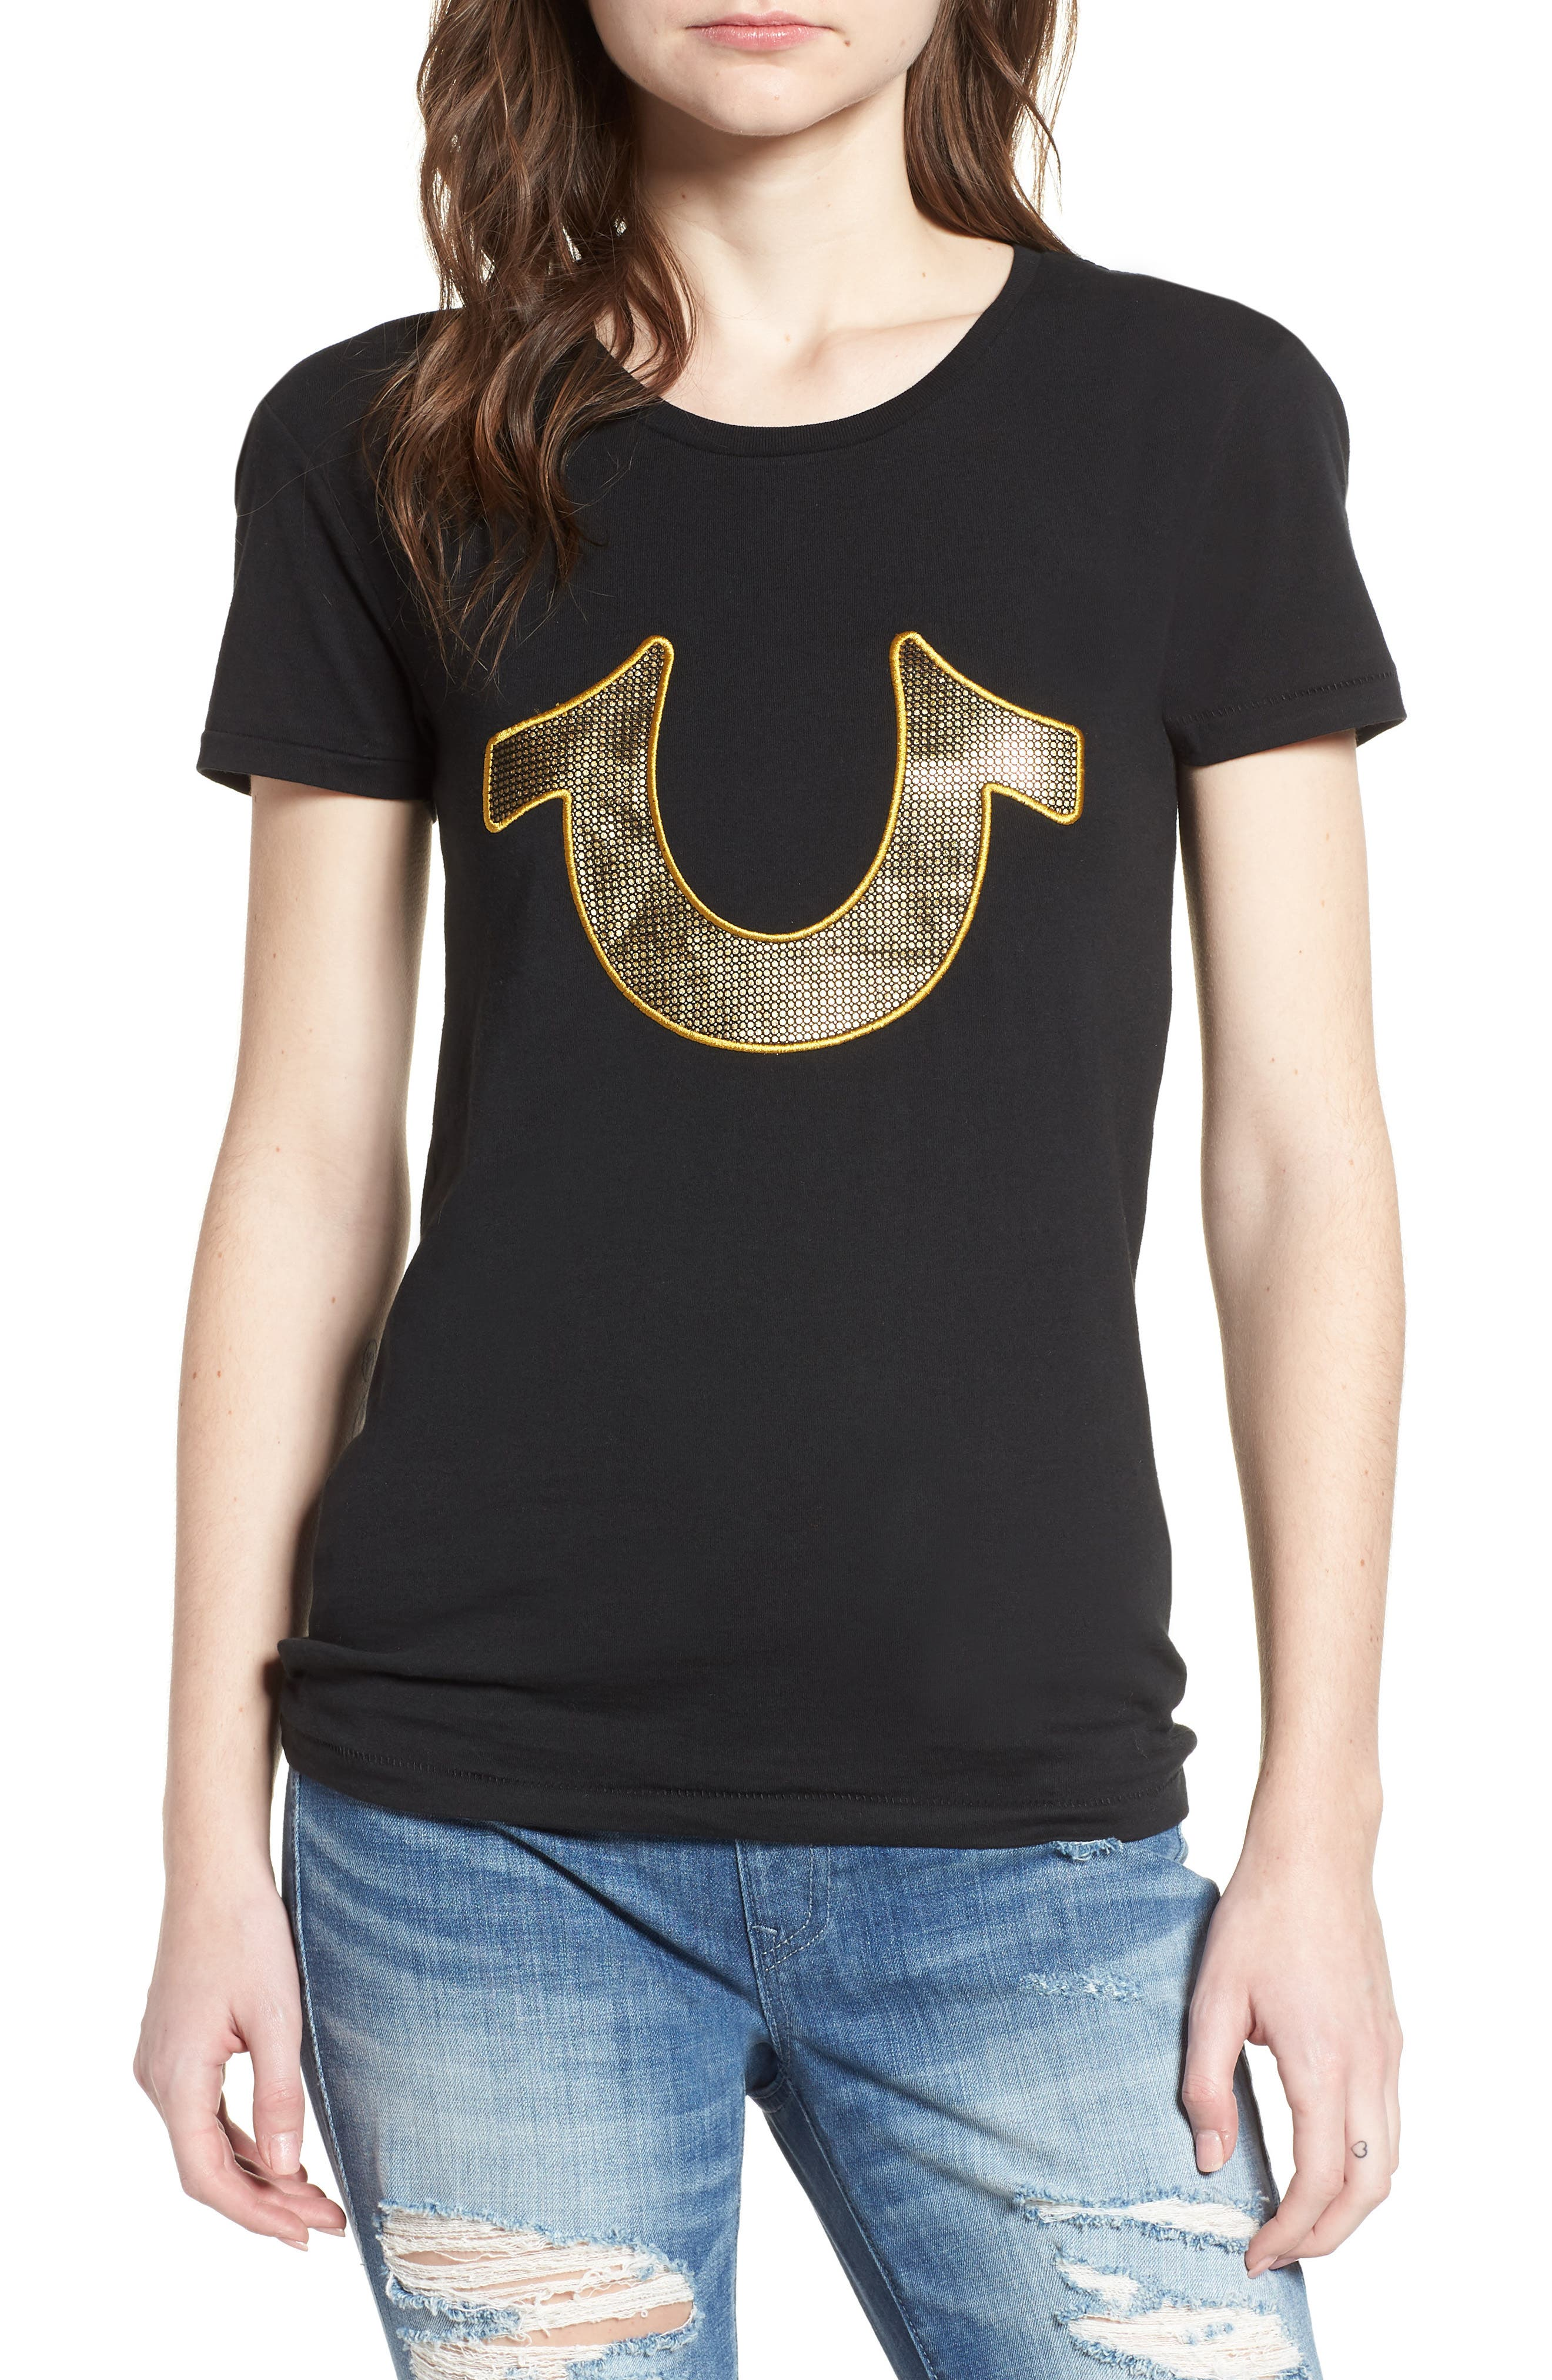 True Religion Brand Jeans Mesh Horseshoe Tee